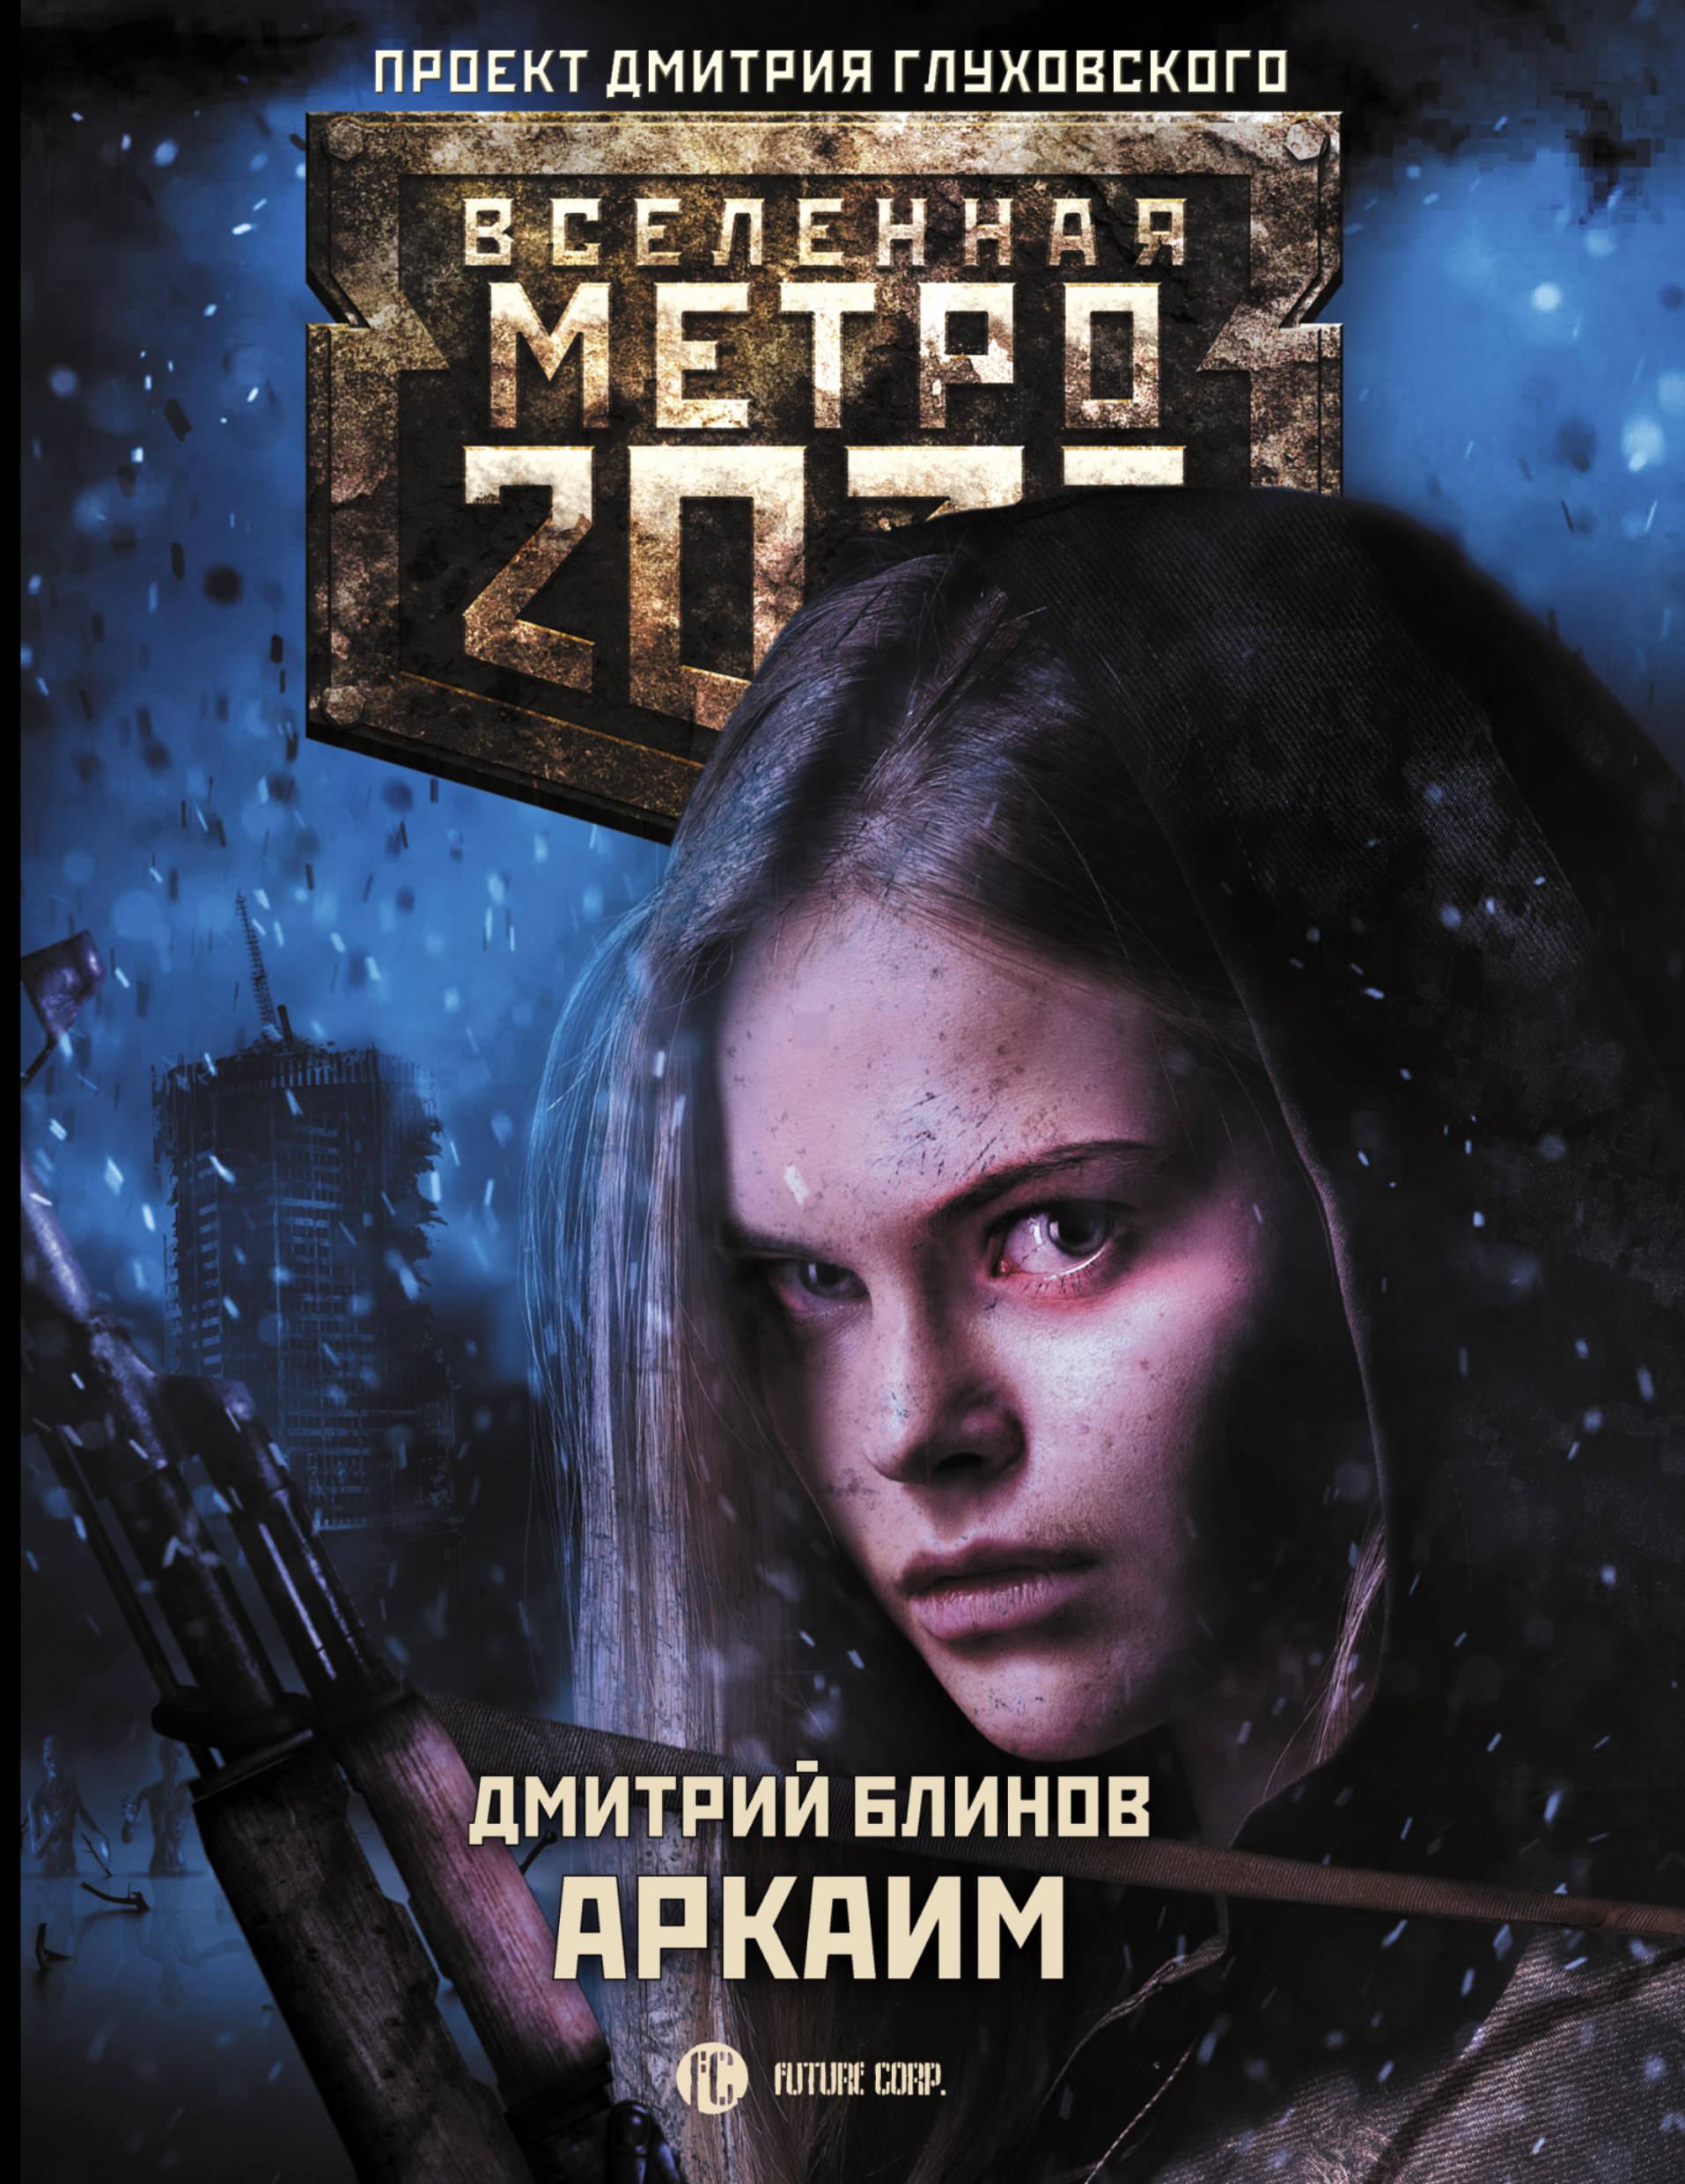 Metro 2033: Arkaim